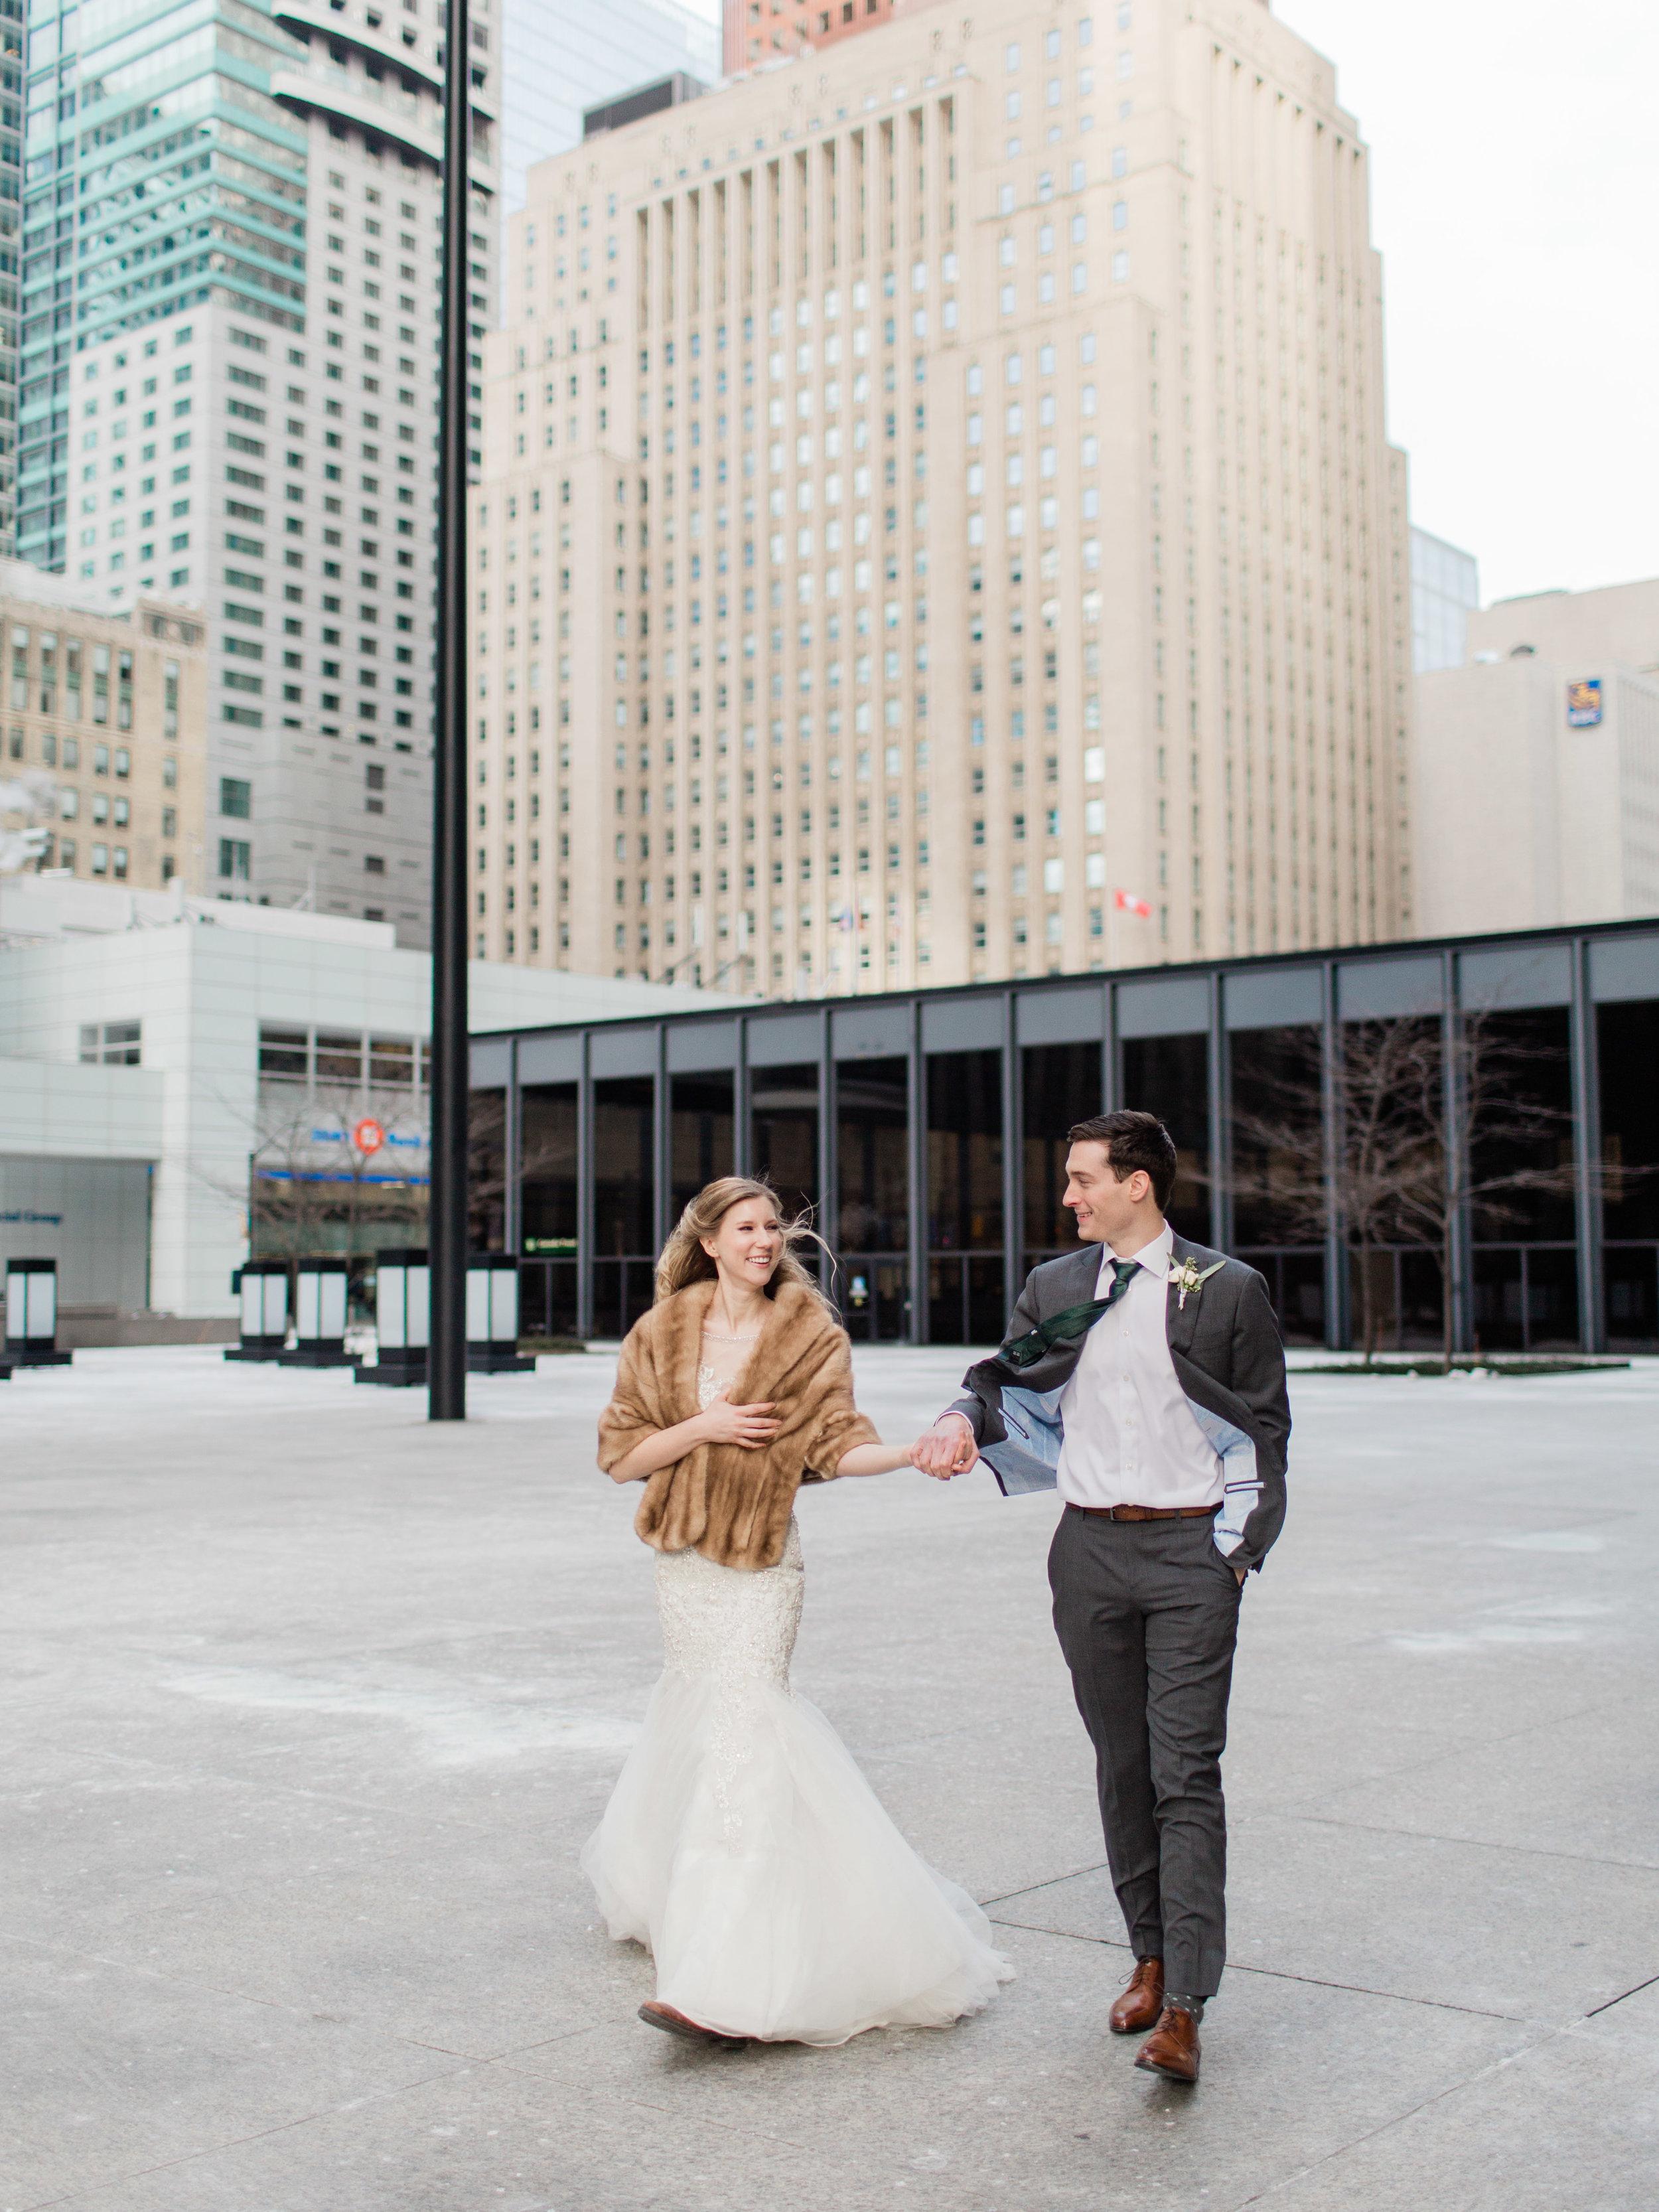 Toronto-wedding-photographer-downtown-winter-wedding-intimate-restaurant-canoe109.jpg